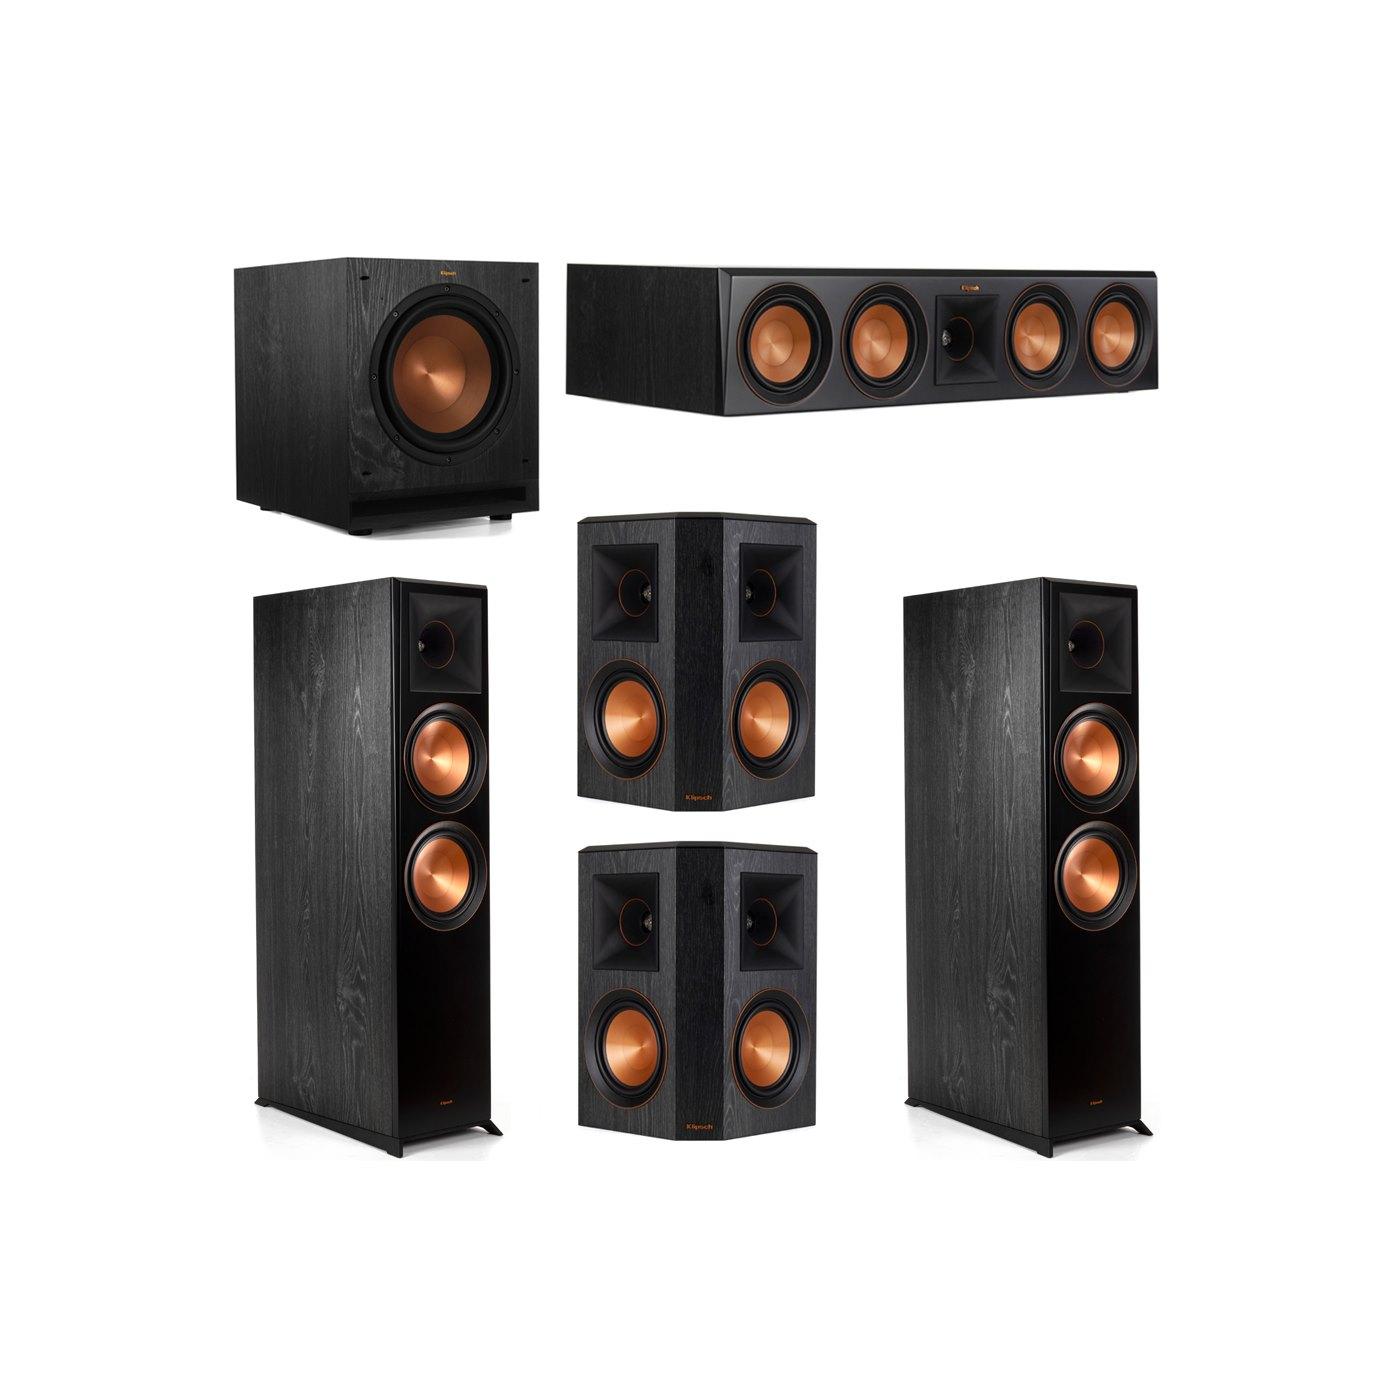 Klipsch 5.1 System with 2 RP-8000F Floorstanding Speakers, 1 Klipsch RP-504C Center Speaker, 2 Klipsch RP-502S Surround Speakers, 1 Klipsch SPL-100 Subwoofer